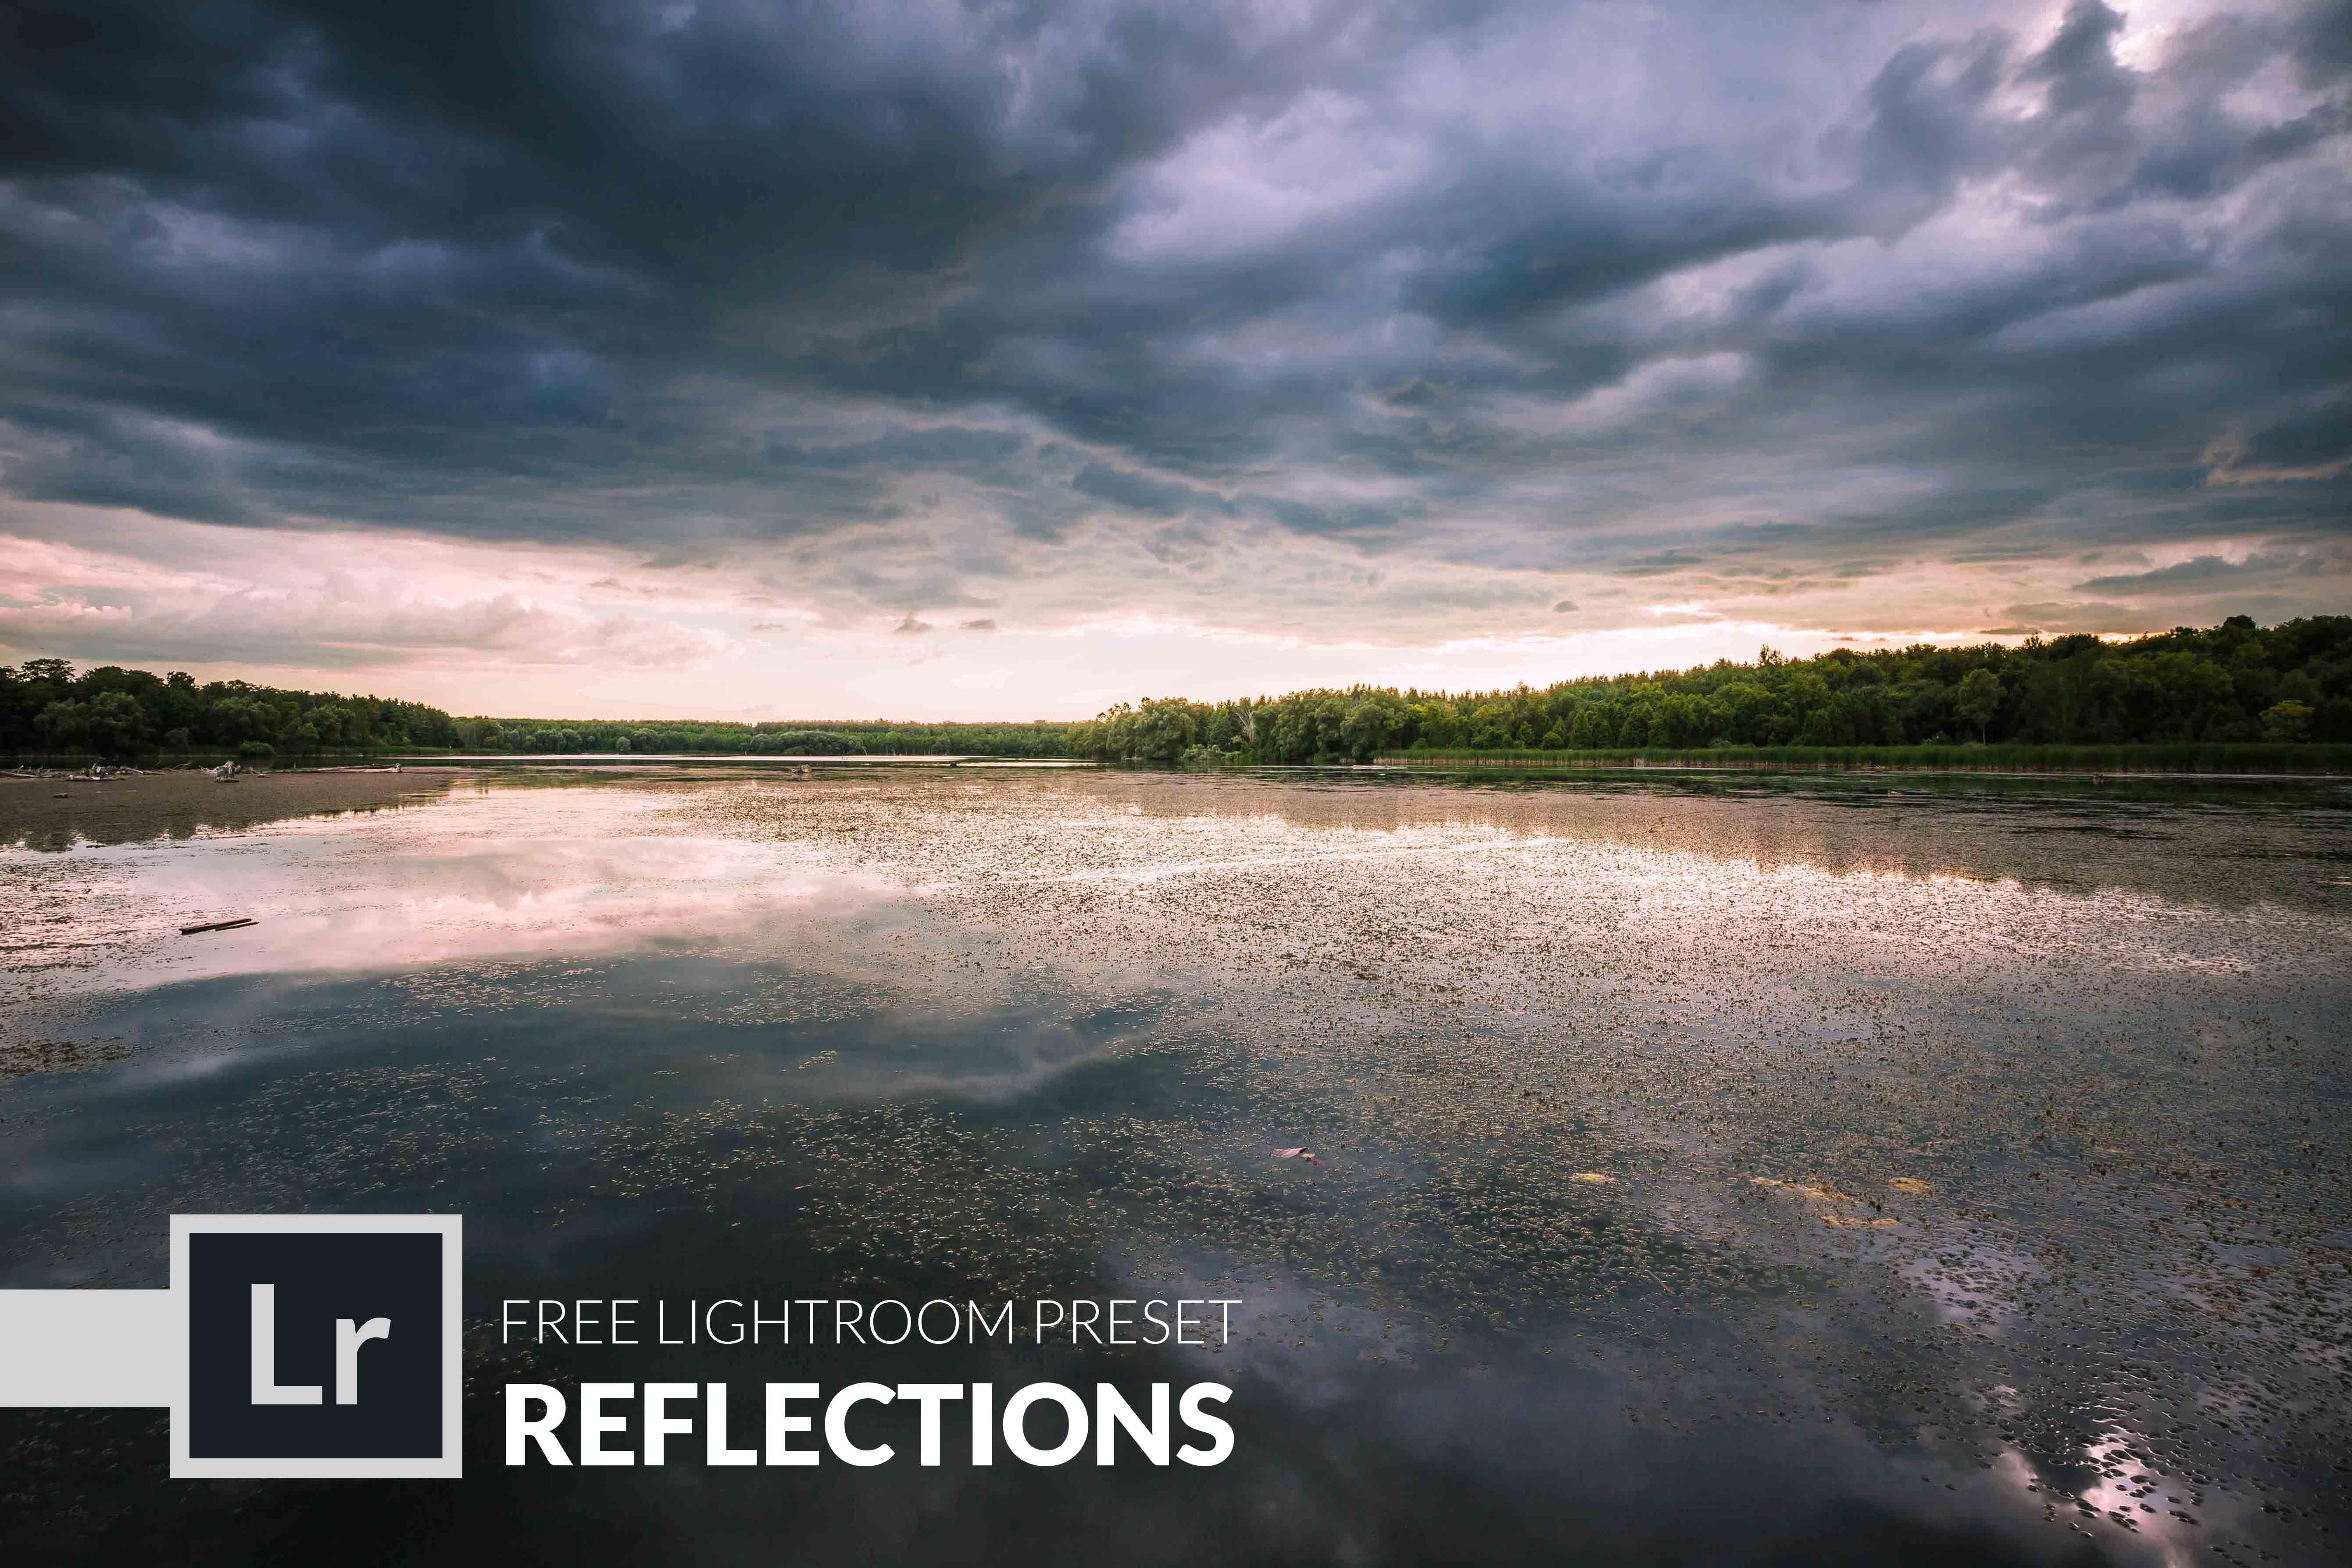 Free Lightroom Preset Reflections